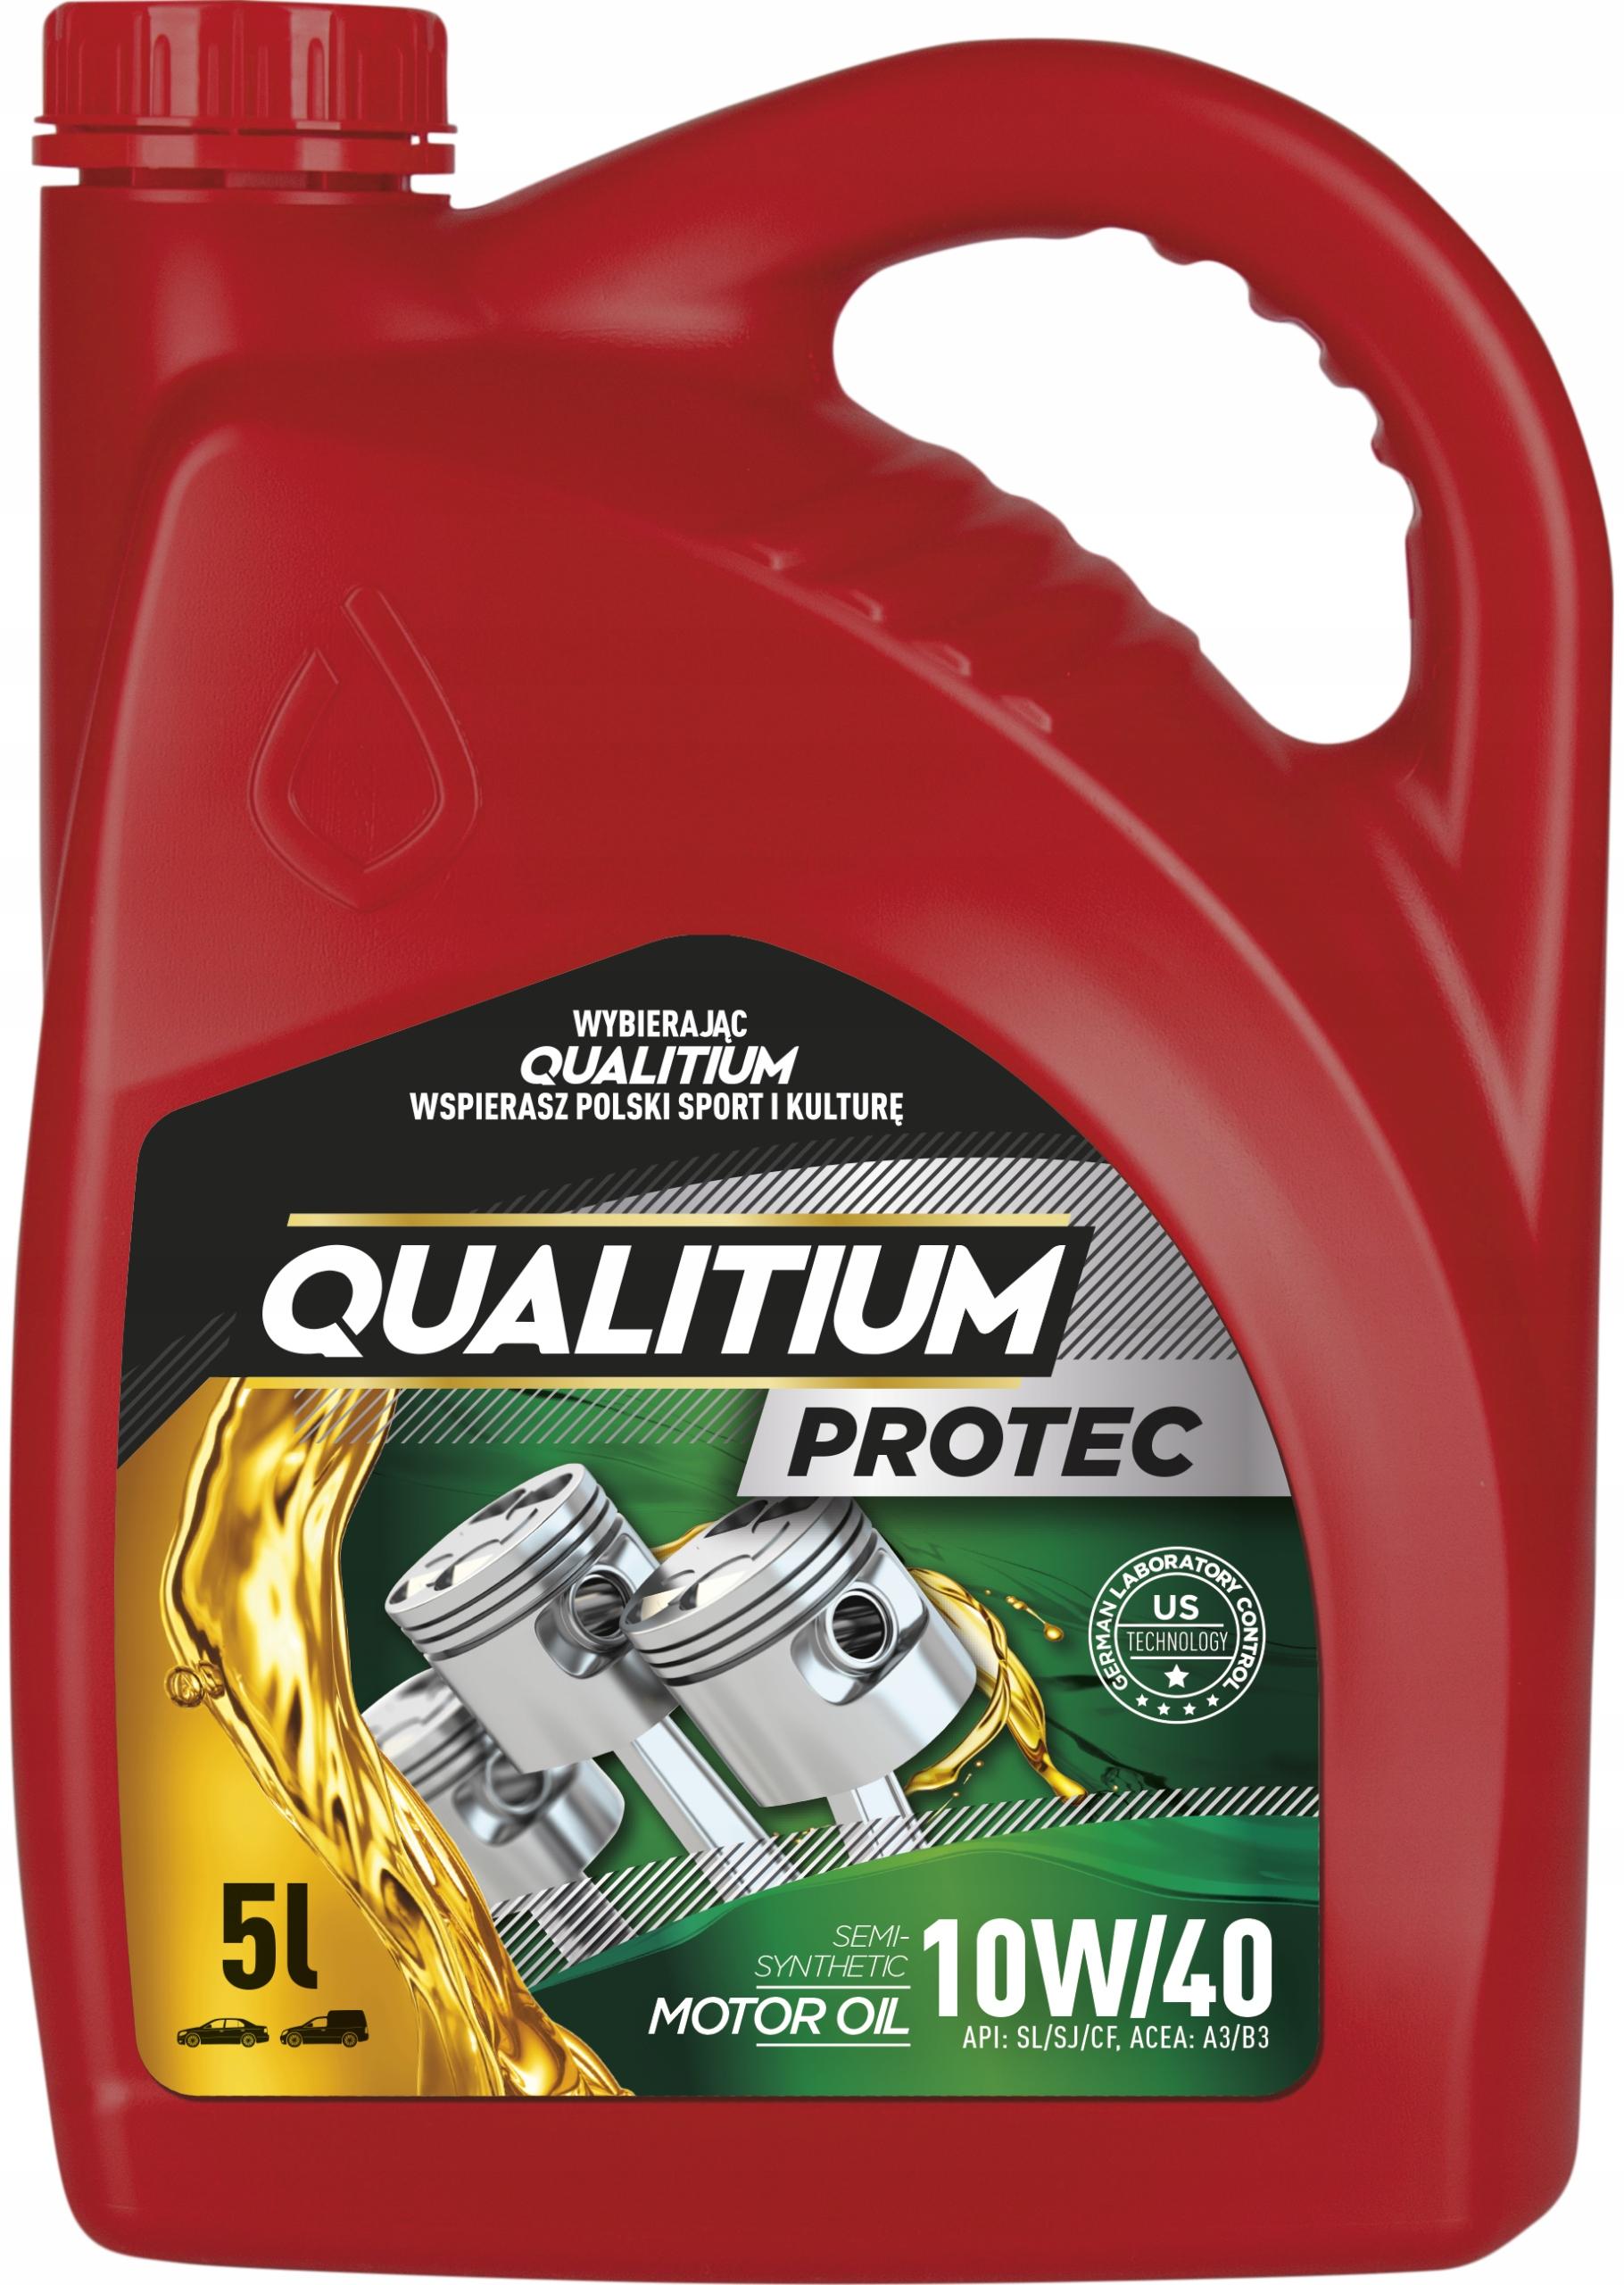 Полусинтетическое масло QUALITIUM PROTEC 10W-40 5L